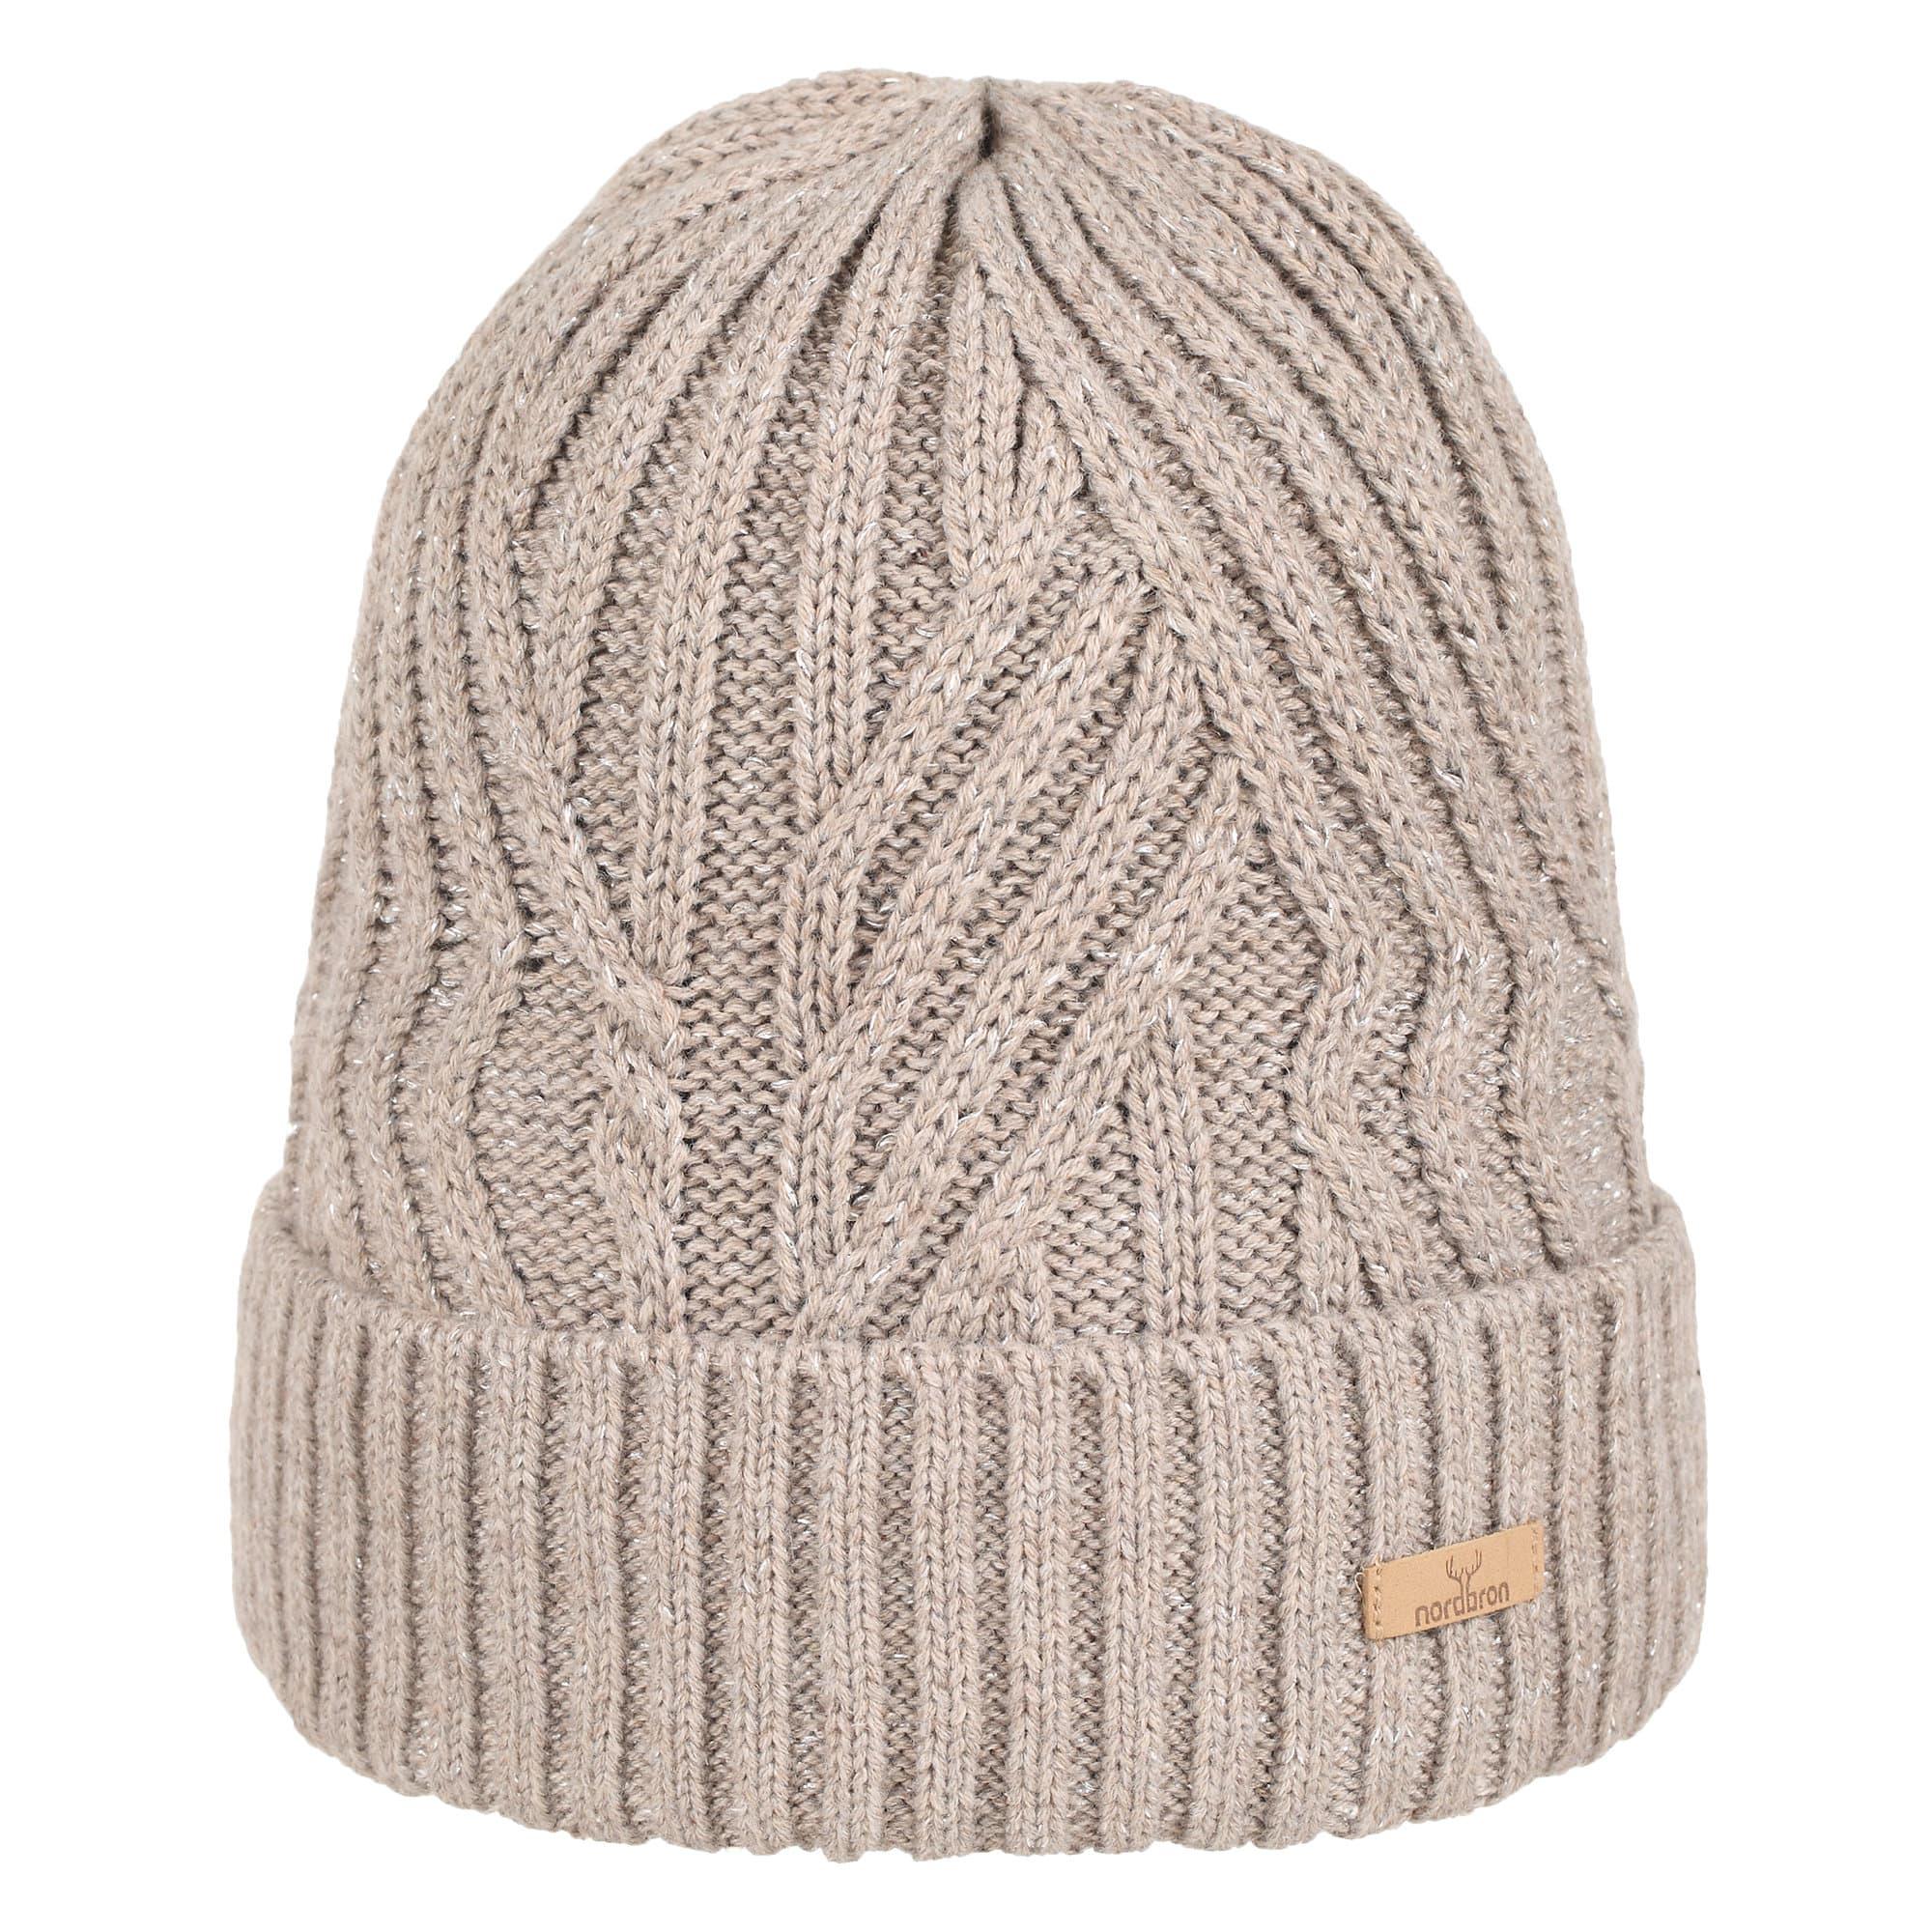 Nordbron DEMAS BEANIE Damen Mütze